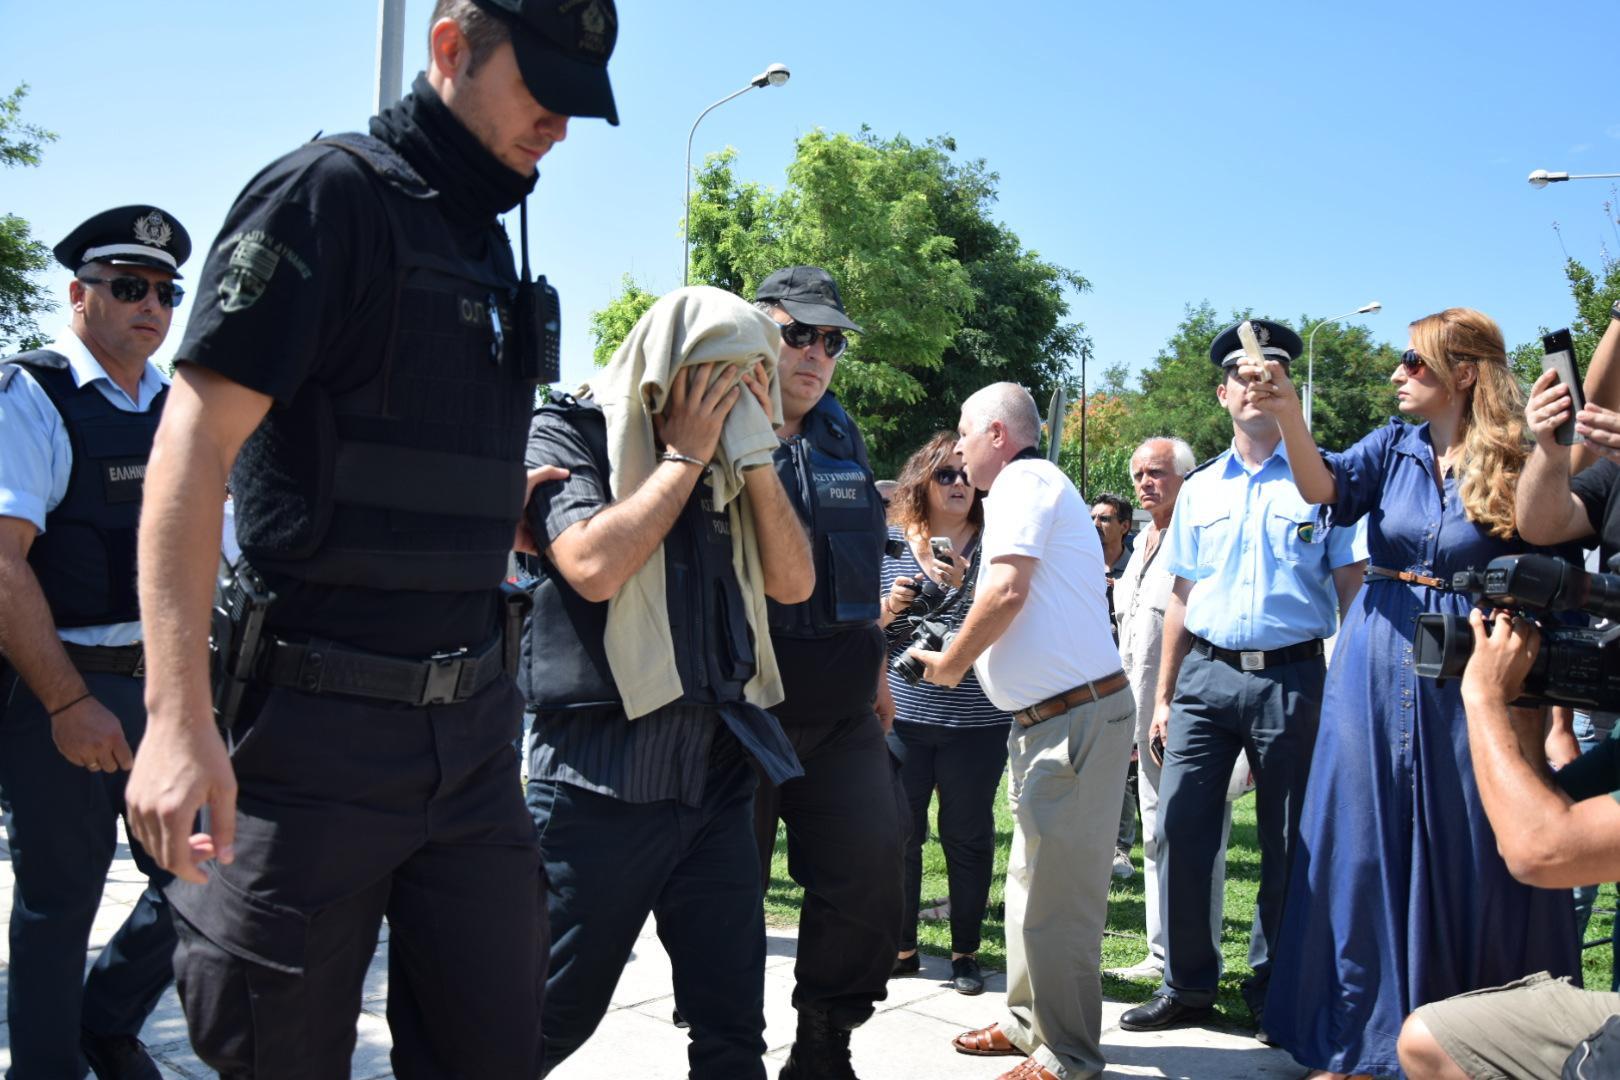 tourkoi-8-anakritis3-1000 Στο δικαστήριο οι 8 Tούρκοι στρατιώτες – Ένταση με διάσημη τρανσέξουναλ από την Τουρκία [εικόνες]